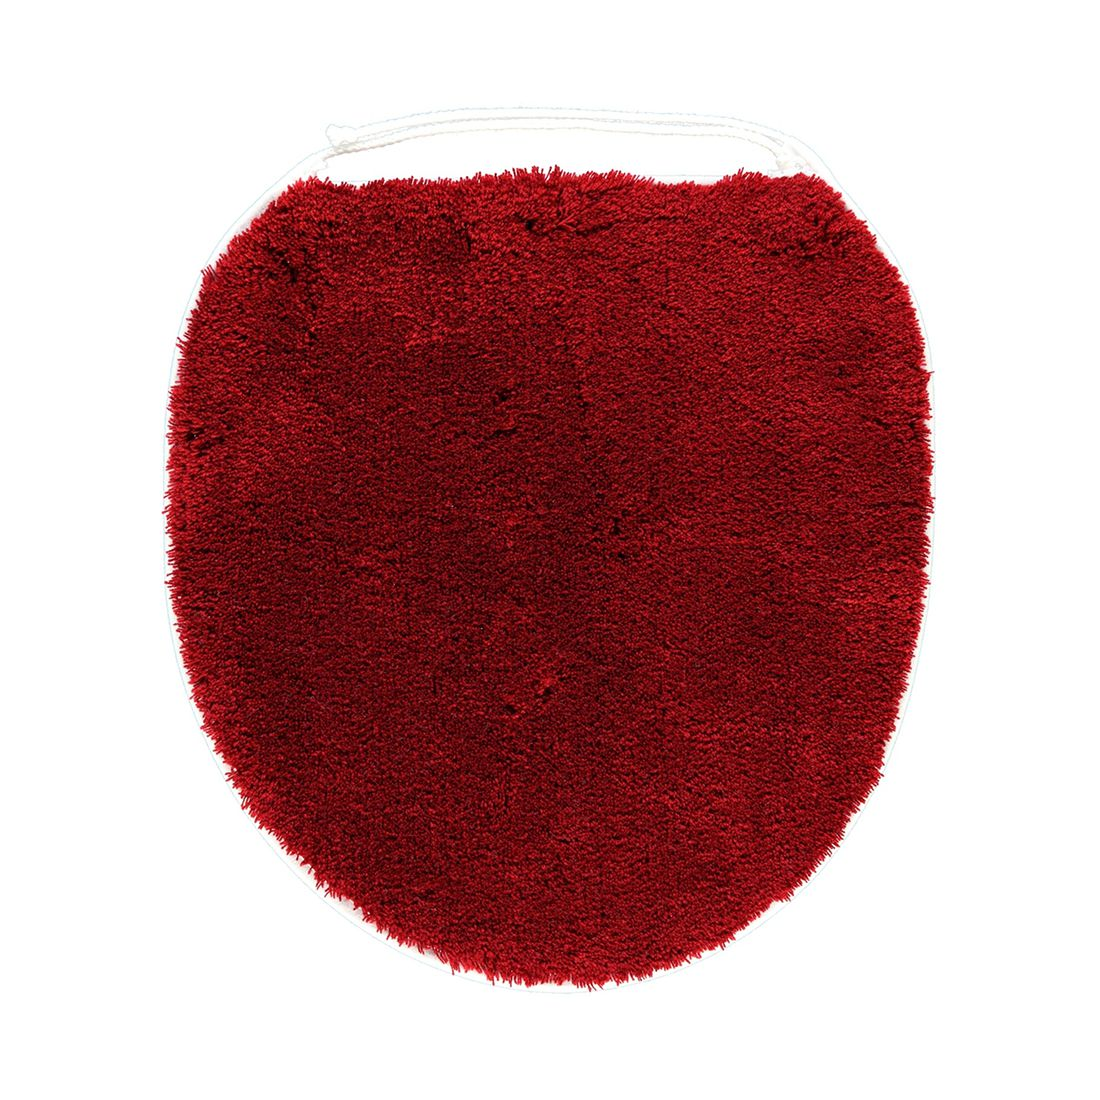 Deckelbezug Soft – 100% Polyacryl Weinrot – 451, Kleine Wolke kaufen